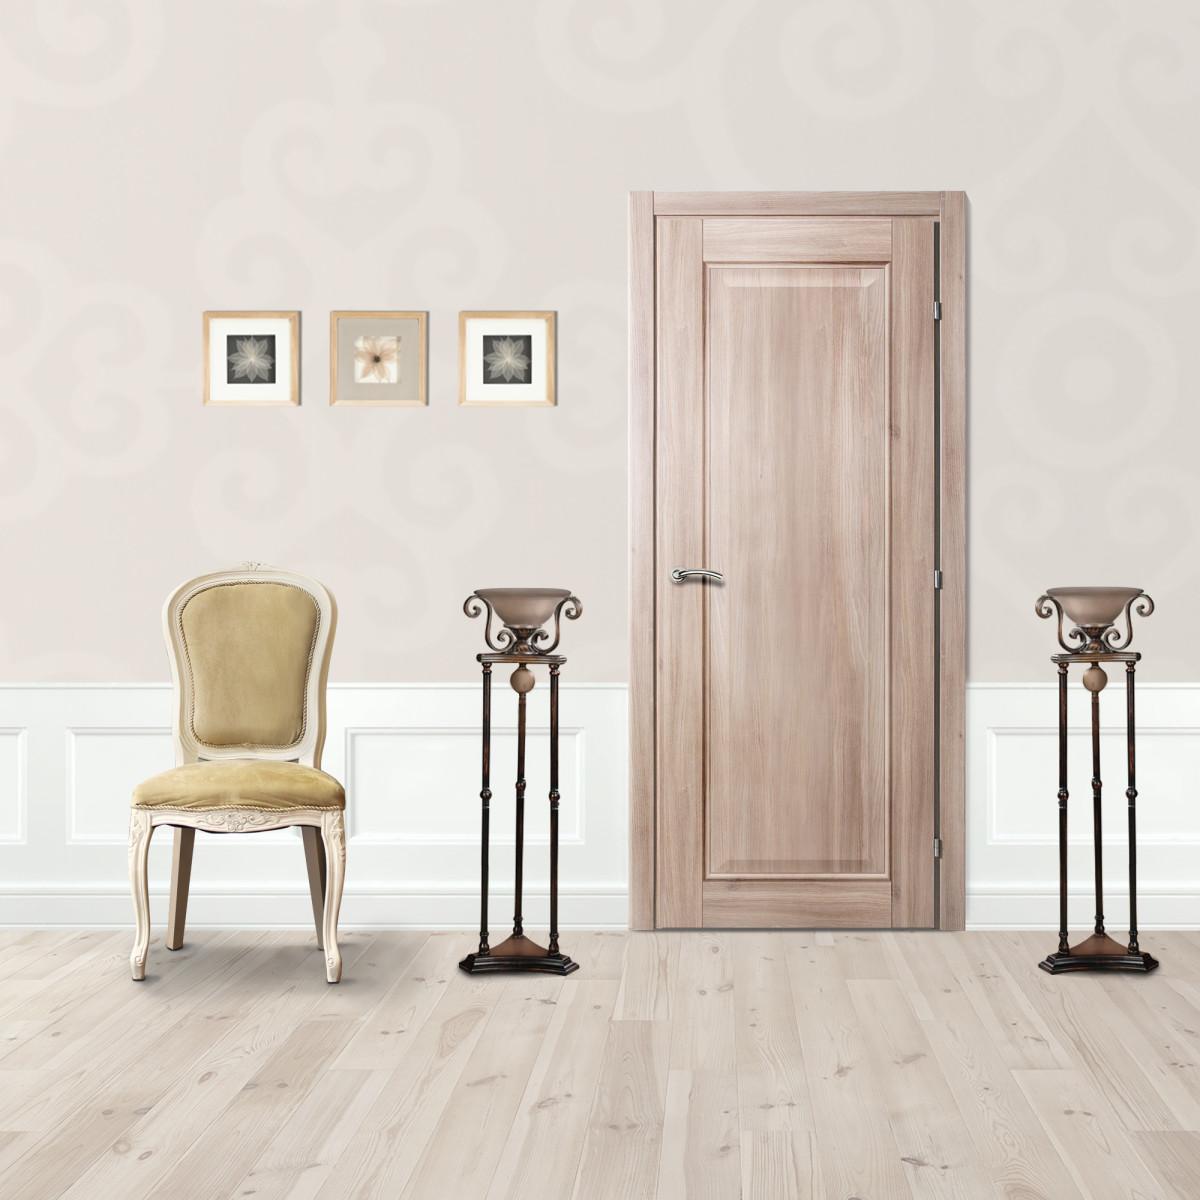 Дверь Межкомнатная Глухая Виктория 60x200 Cpl Цвет Акация С Фурнитурой